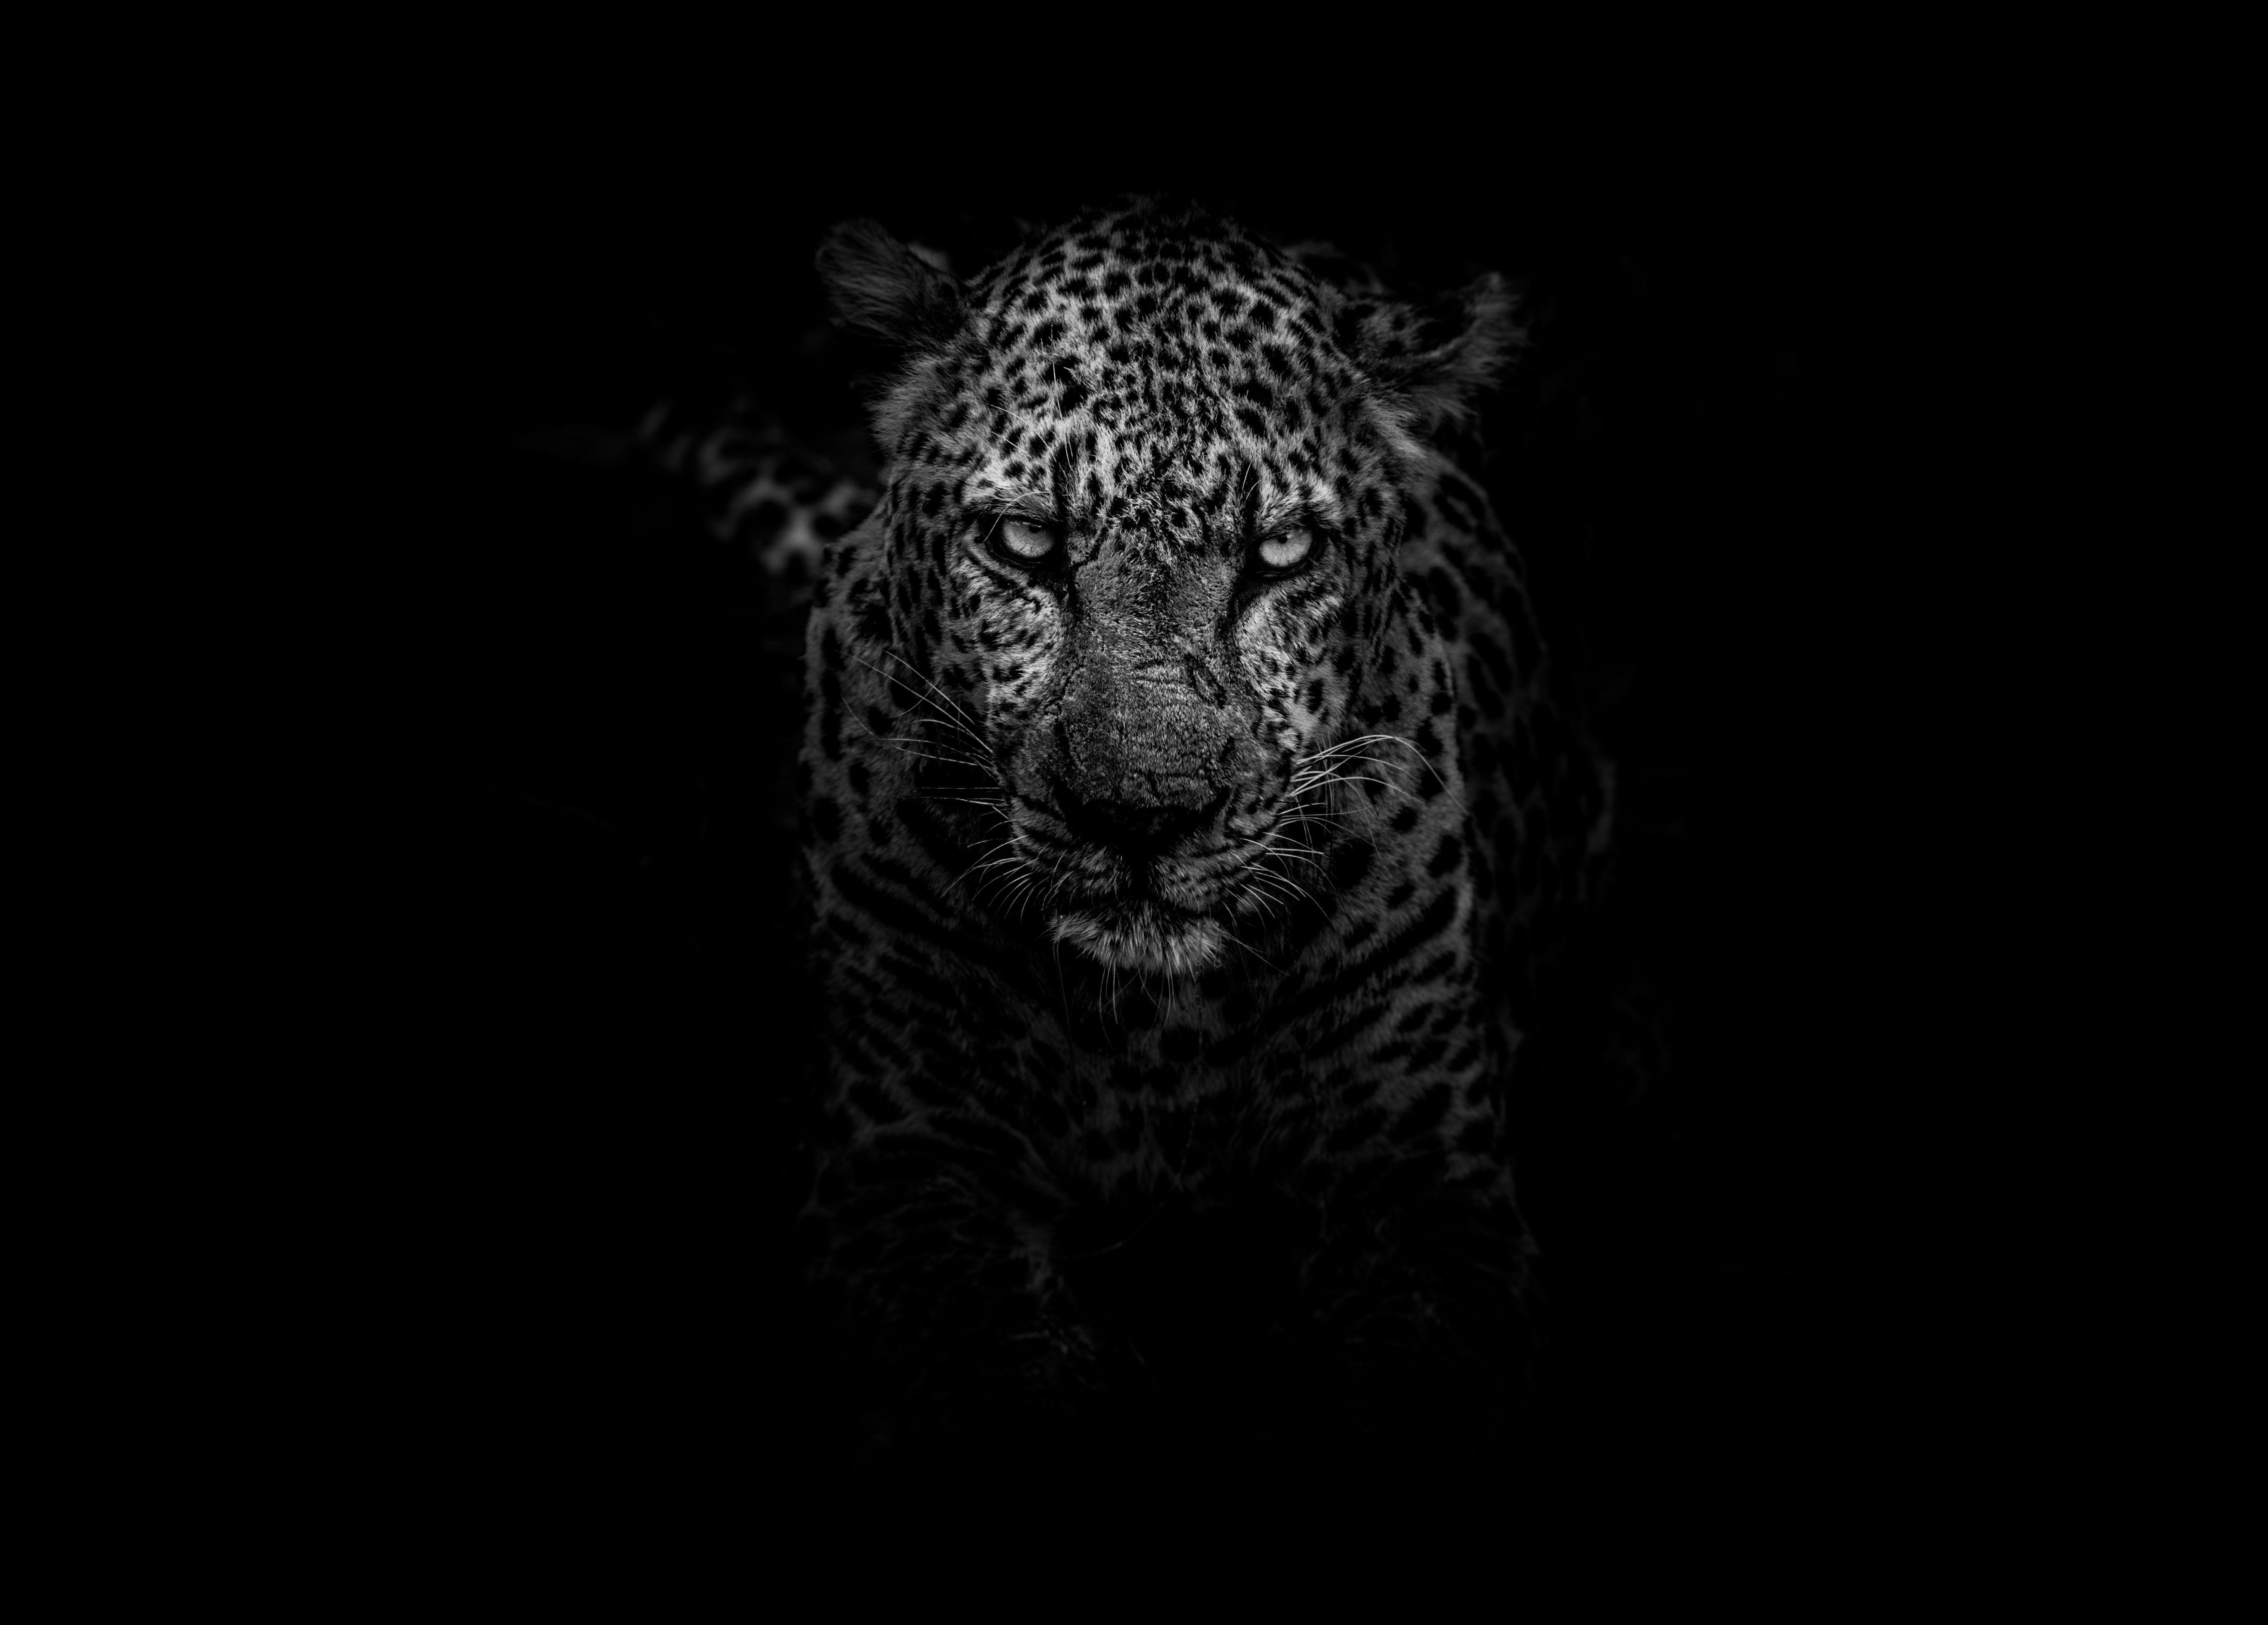 Leopard Animals Dark Hd Monochrome Black And White 4k 5k 5k Wallpaper Hdwallpaper Desktop Leopard Pictures Animal Wallpaper Jaguar Animal